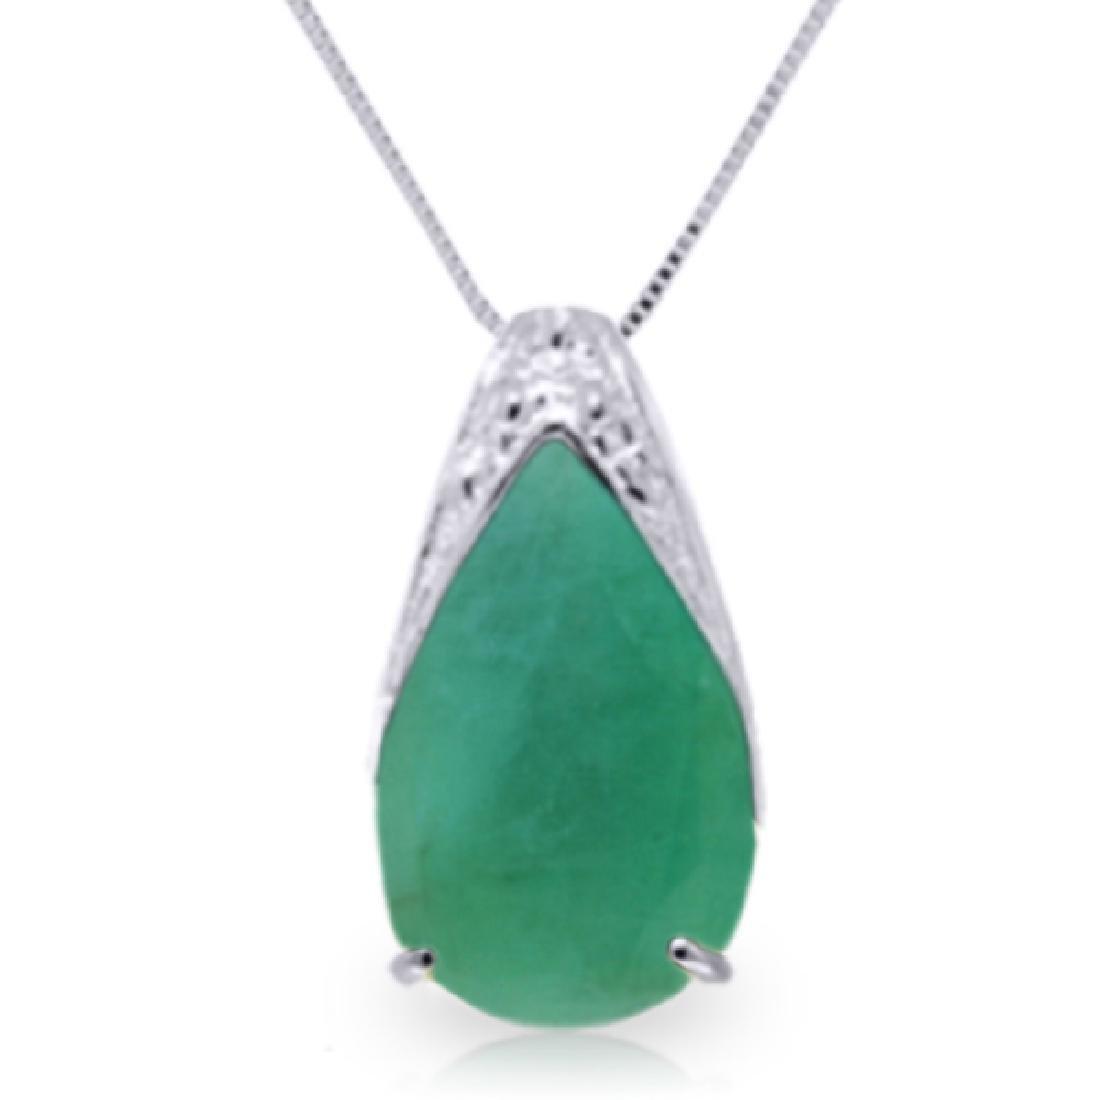 Genuine 3.5 ctw Emerald Necklace Jewelry 14KT White